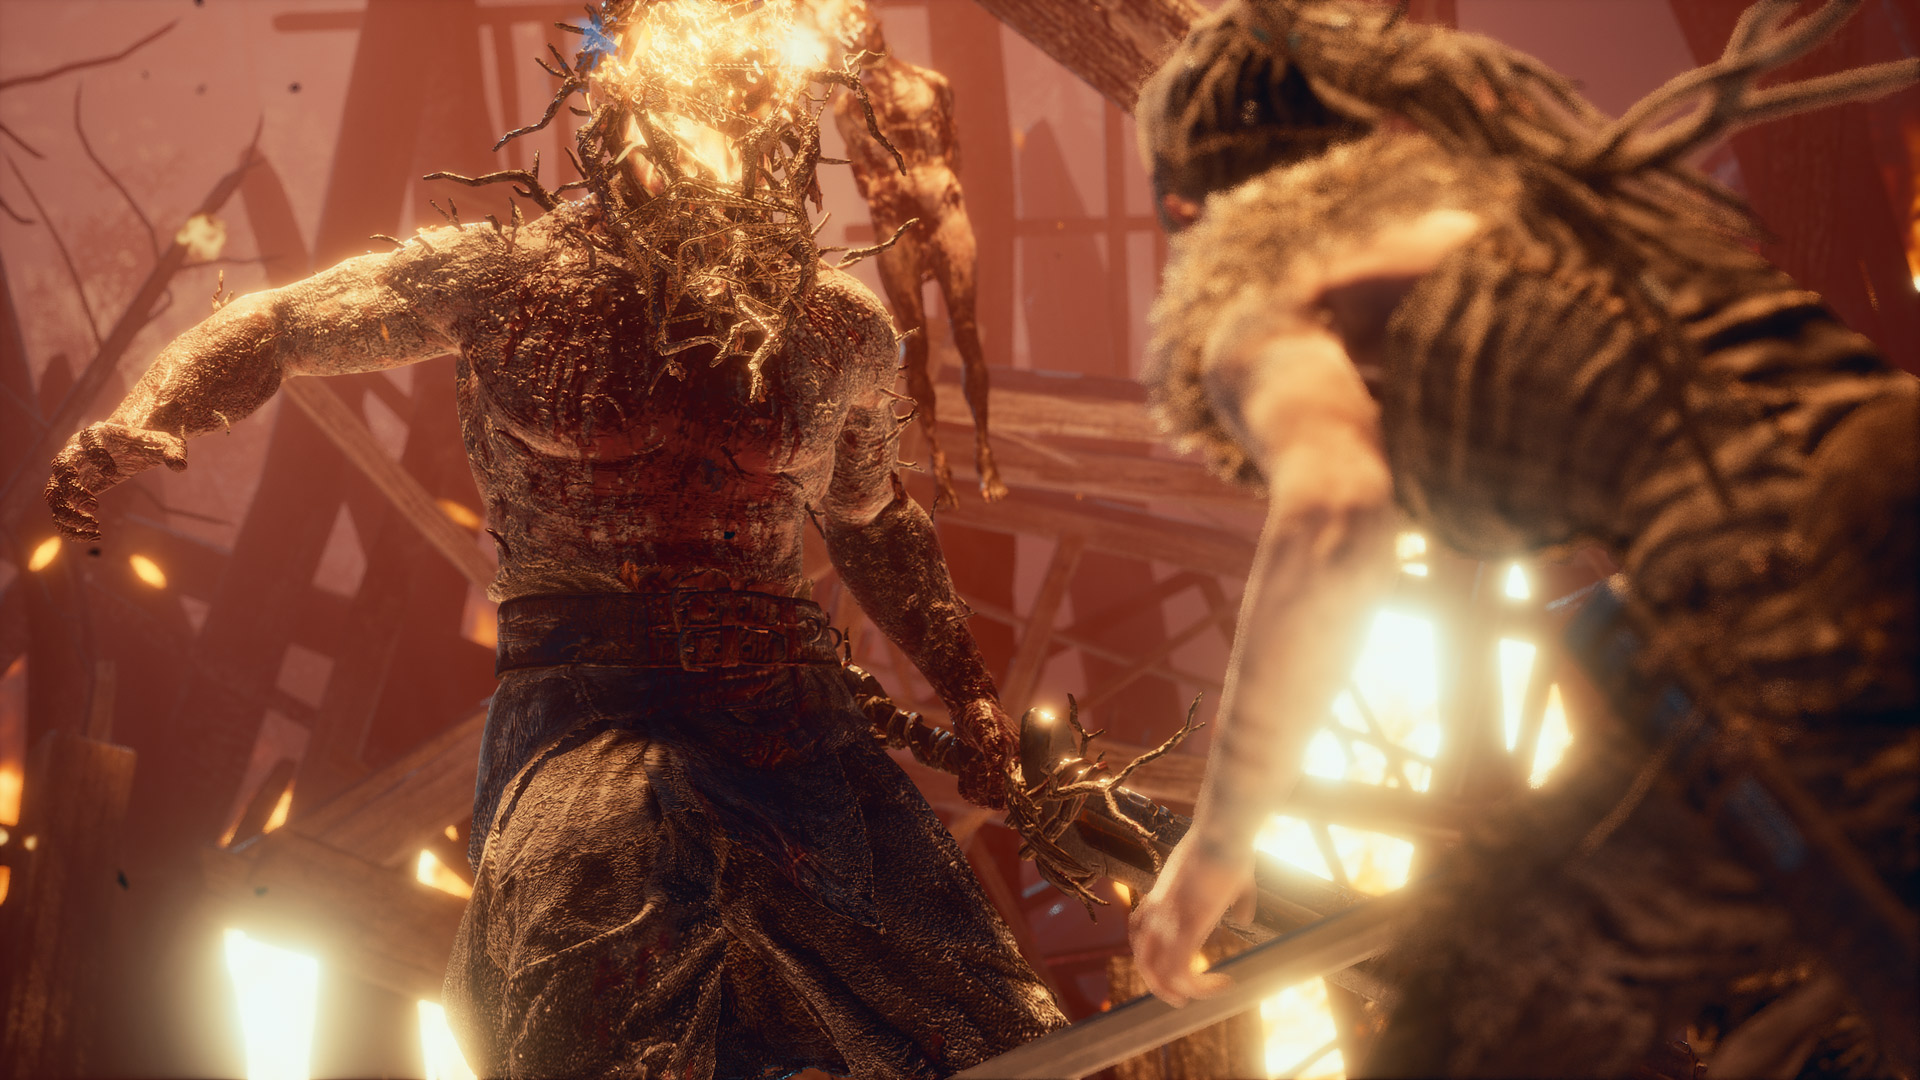 Hellblade release date